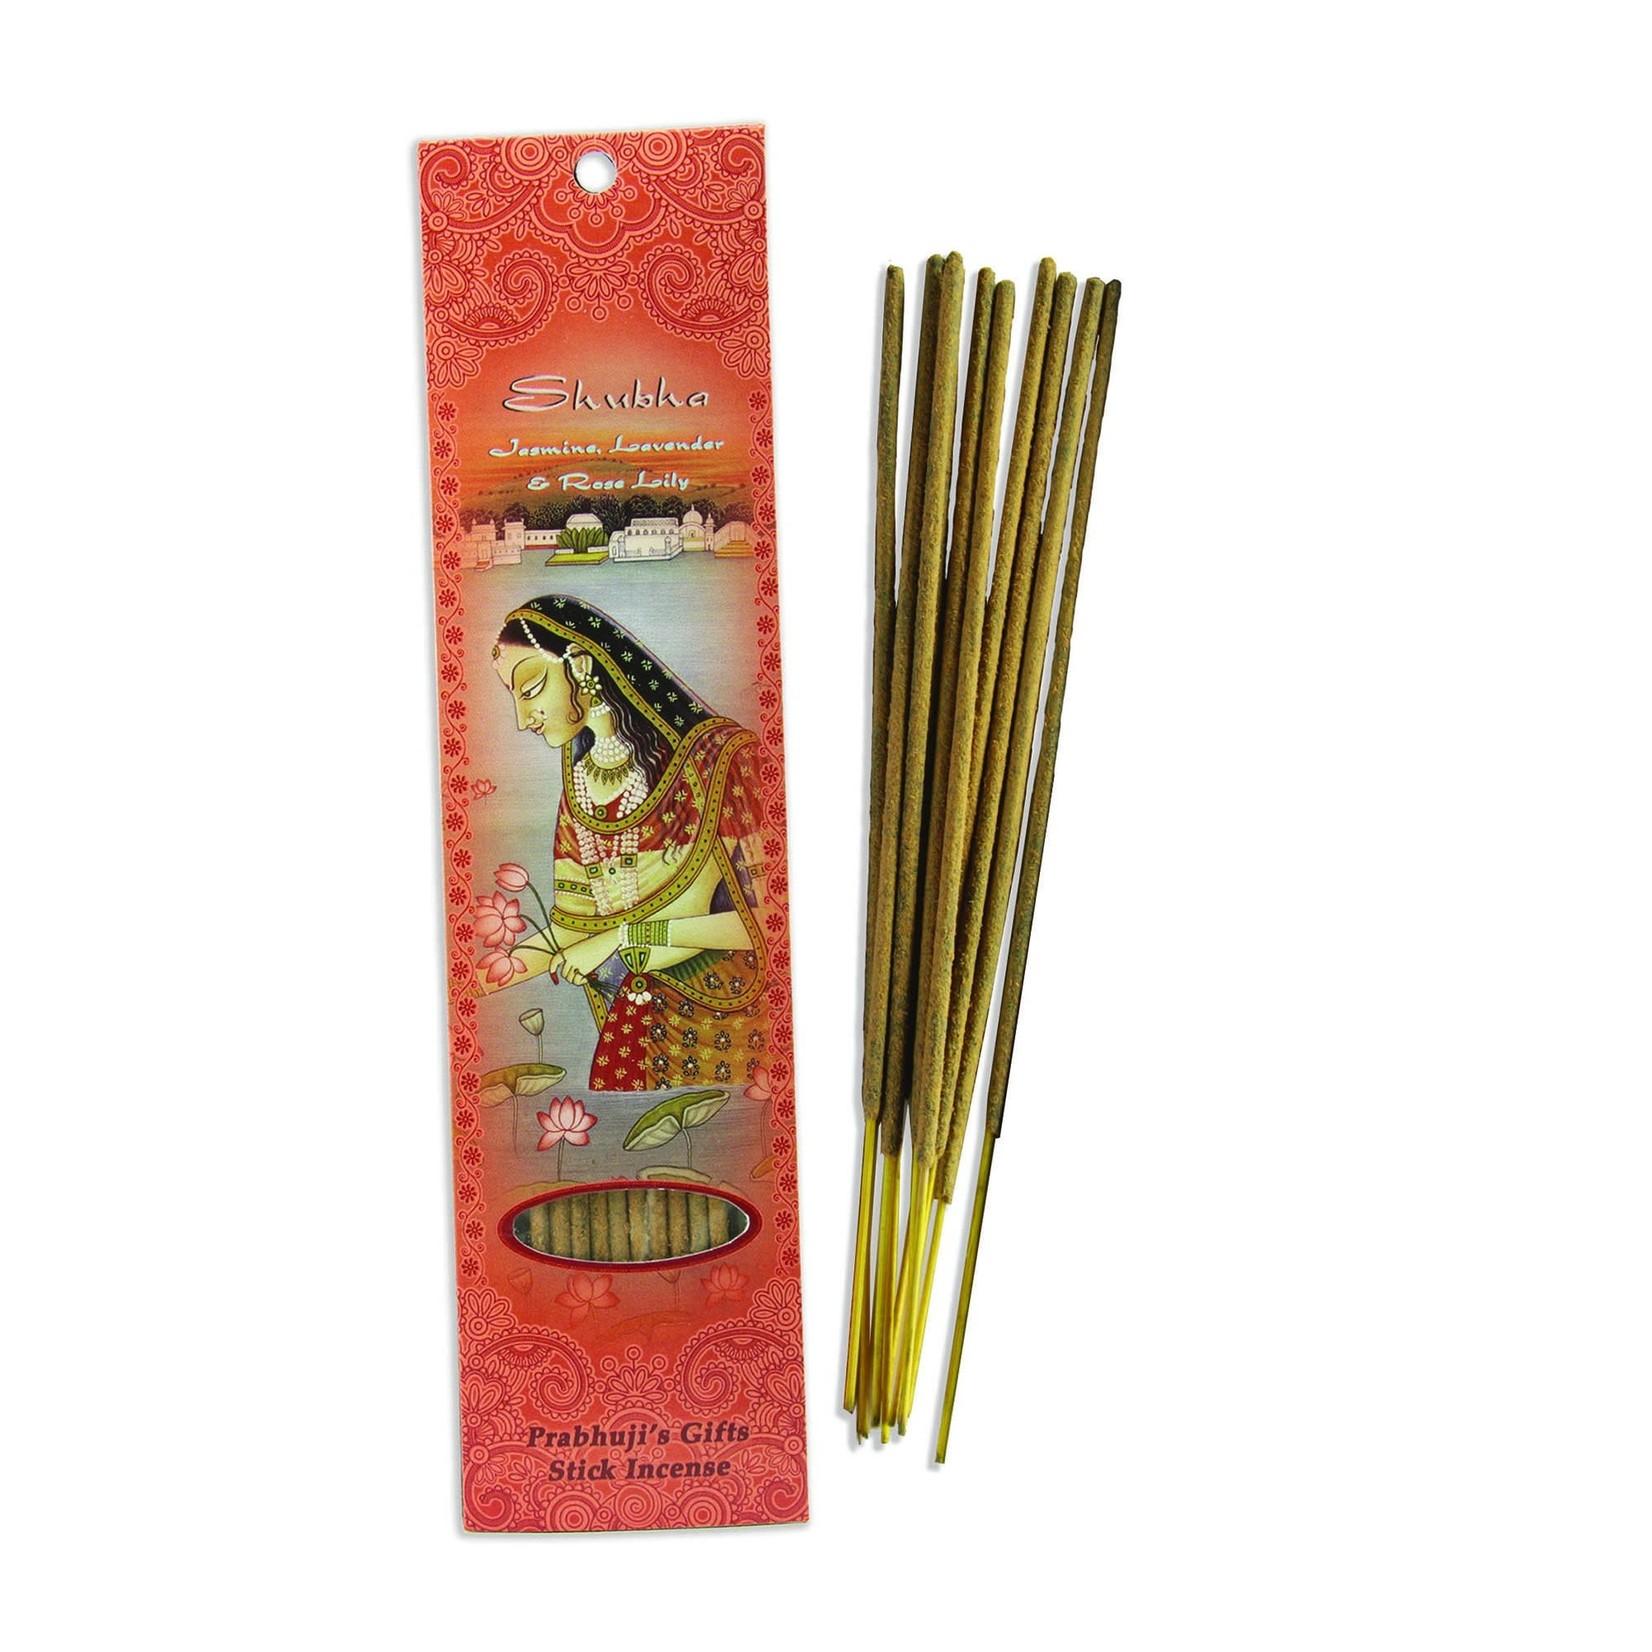 Prabhujis Gifts Shubha - Jasmine, Lavender, Rose Lily Incense Sticks